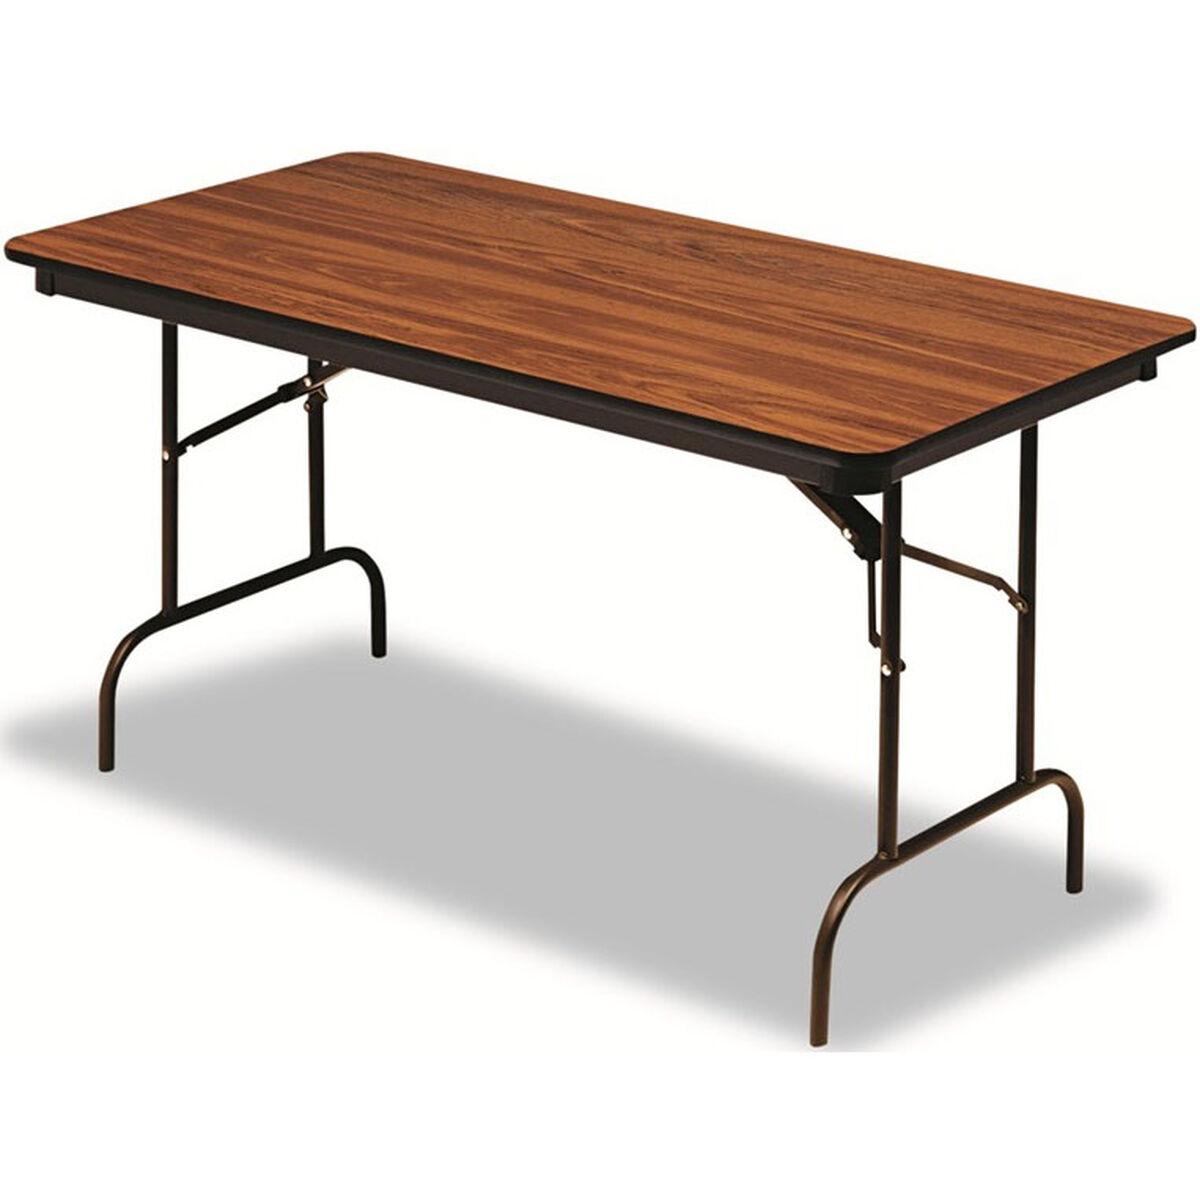 Iceberg premium 30 39 39 w x 72 39 39 d wood laminate folding for Nfpa 72 99 table 7 3 2